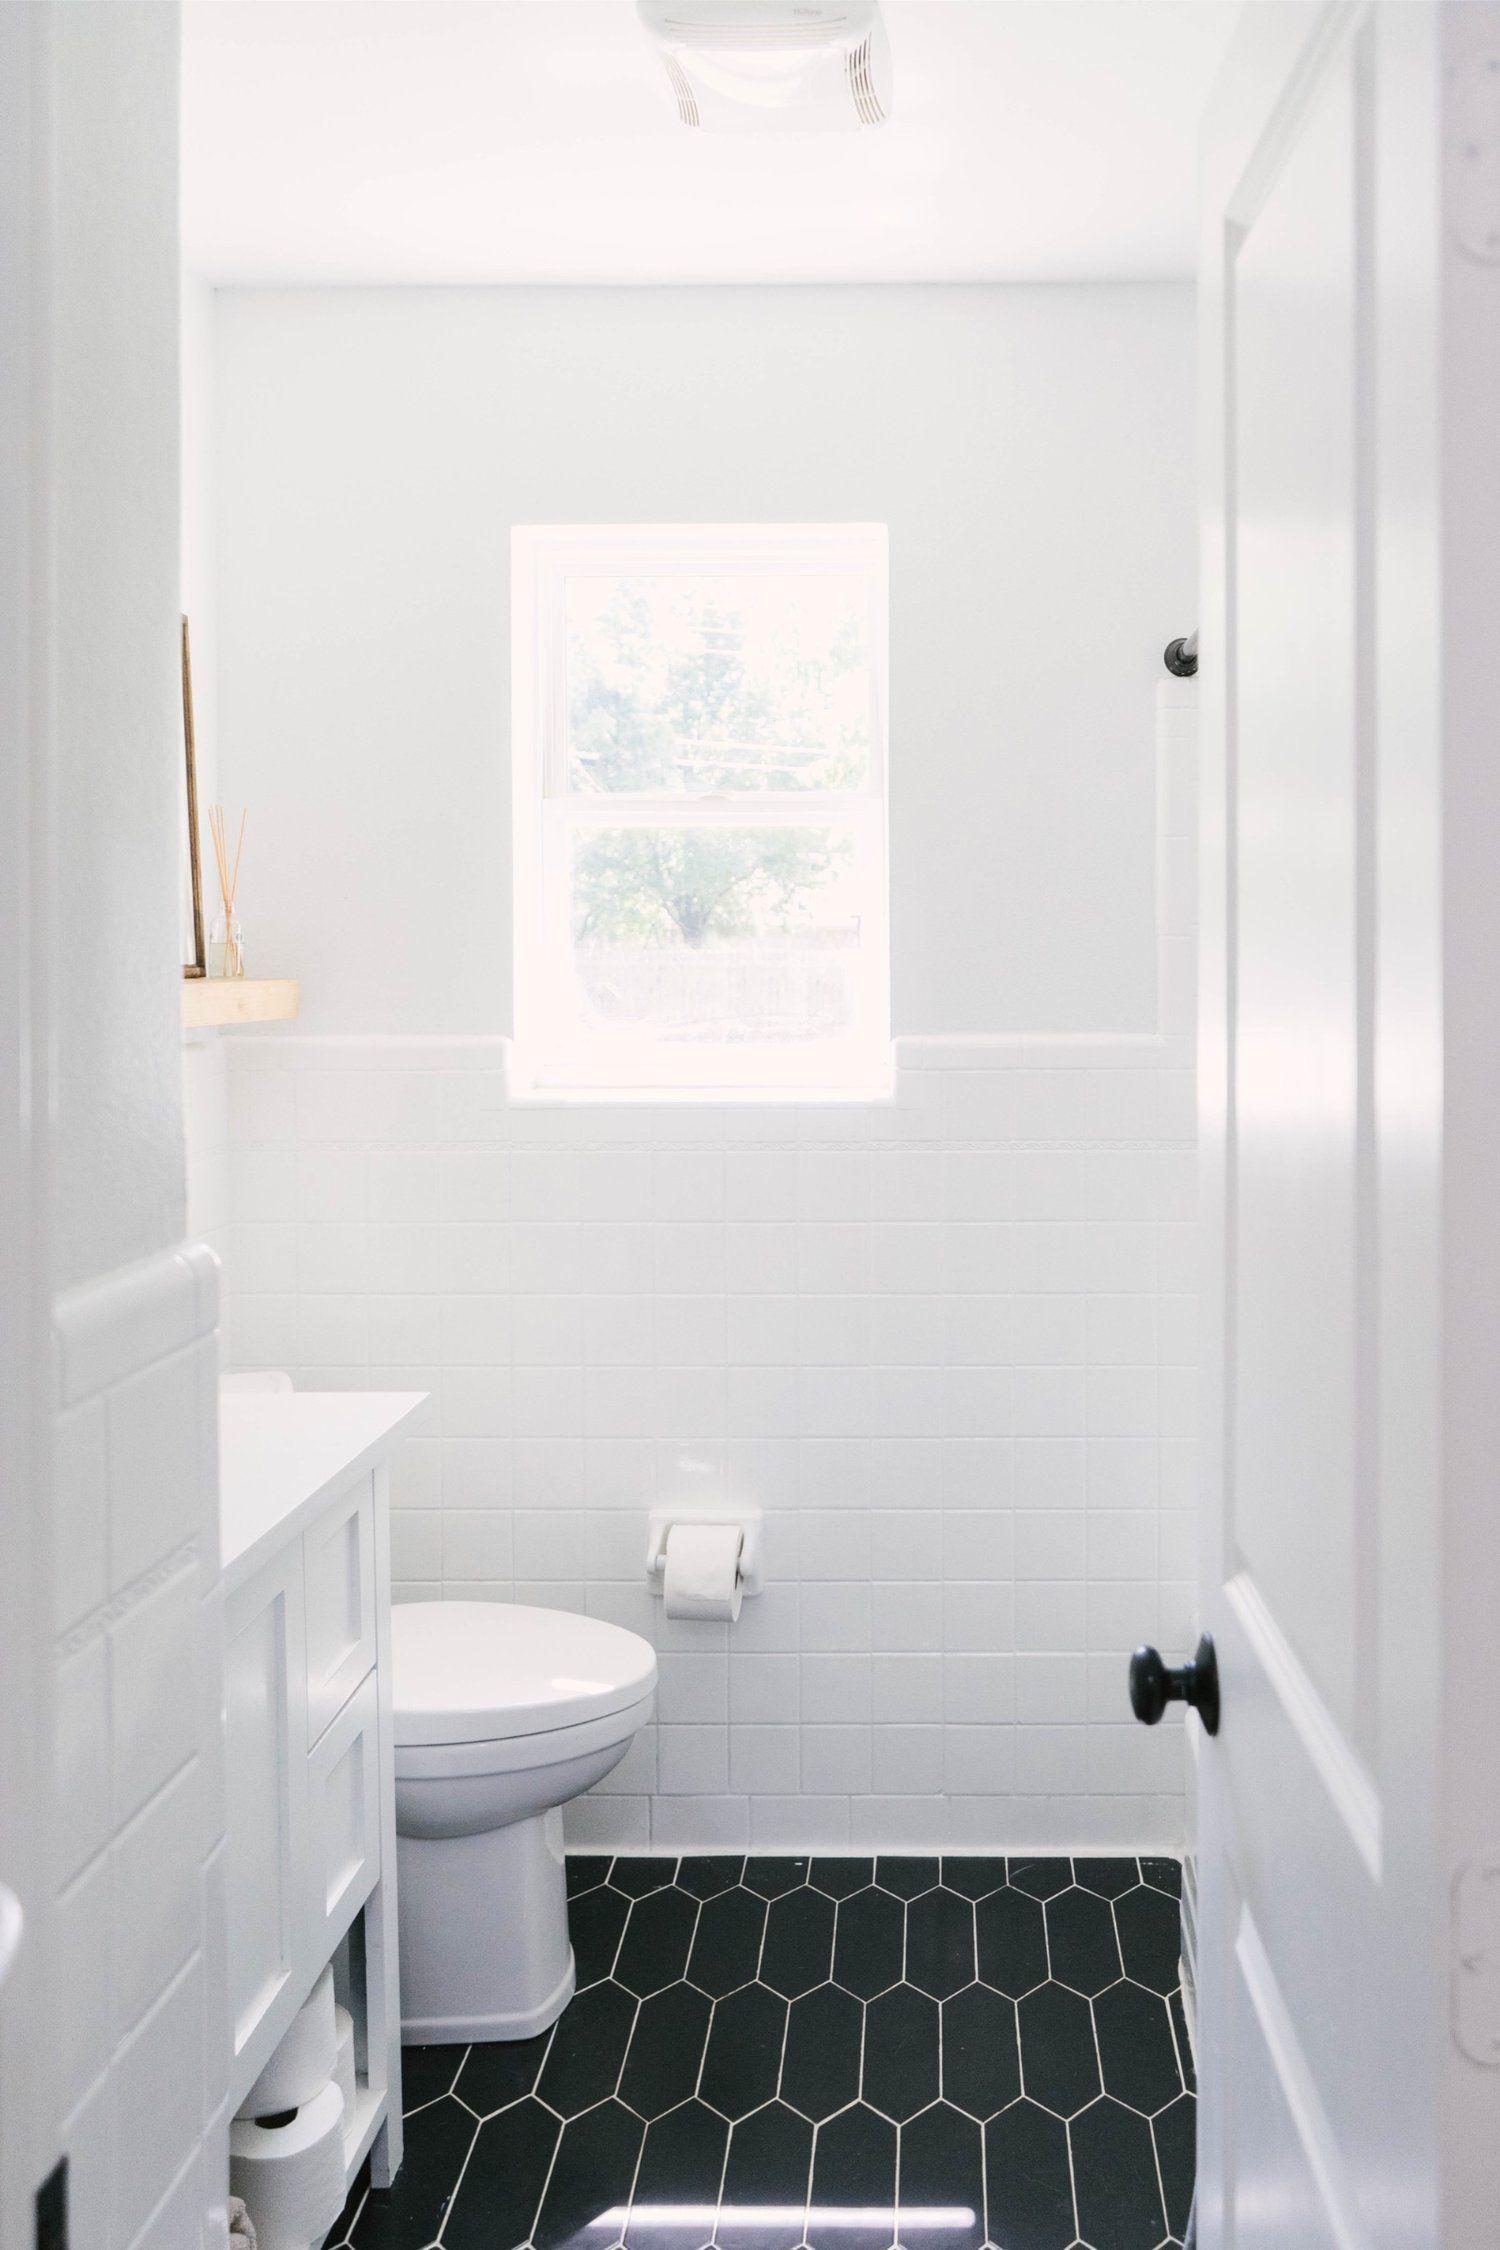 Example Of Tile Paint Before And After In A Bathroom Bathroom Design Options Tile Bathroom Reglazed Bathroom Tile